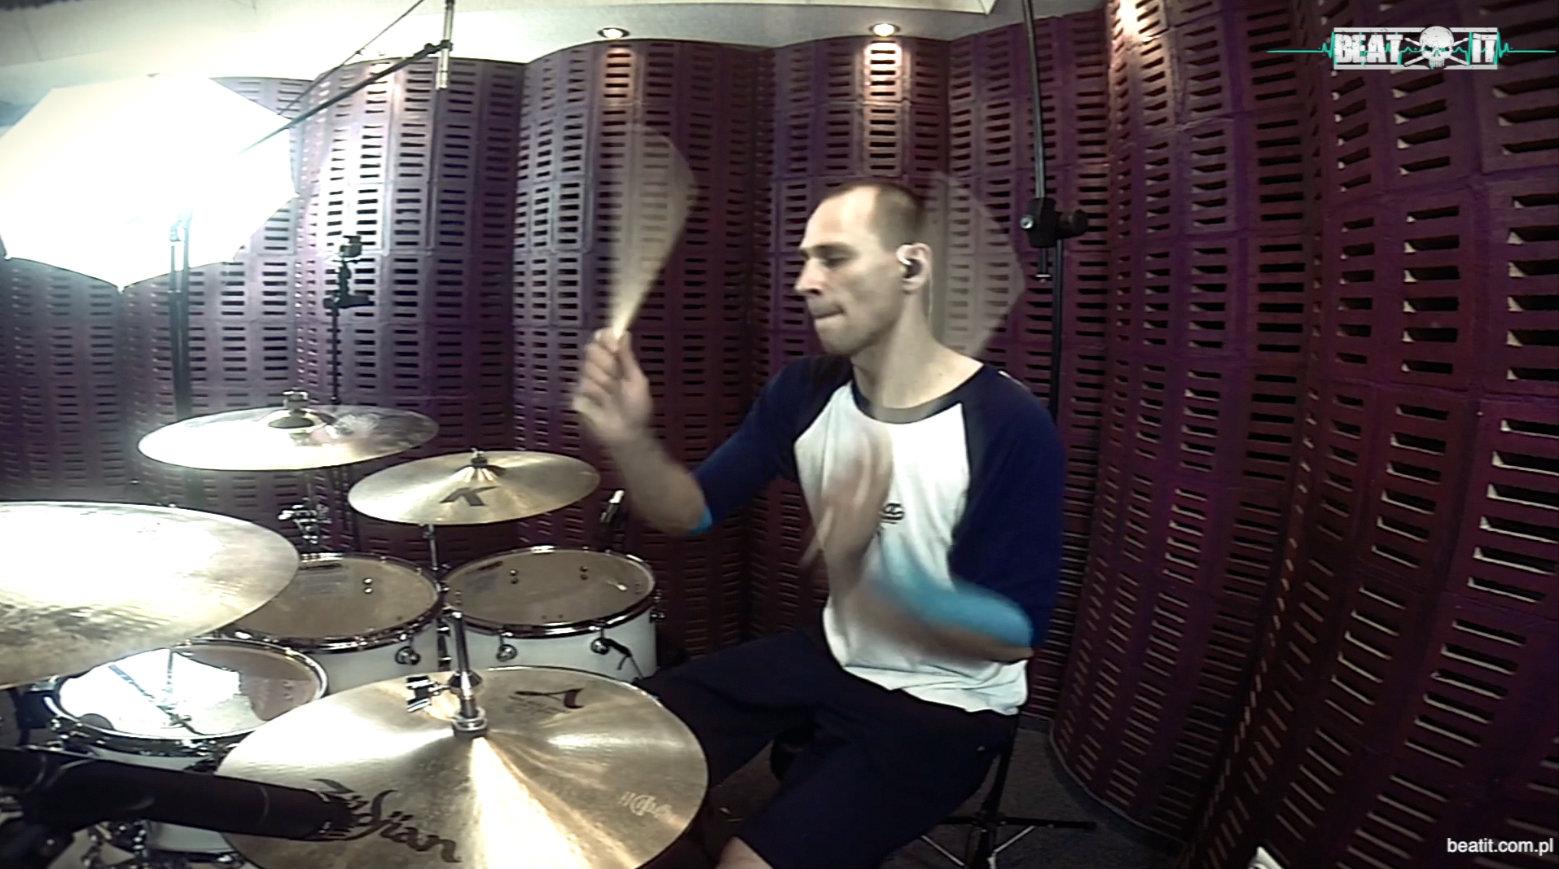 M. Sieroszewski – 'Don't Stand So Close To Me' Drum Cover